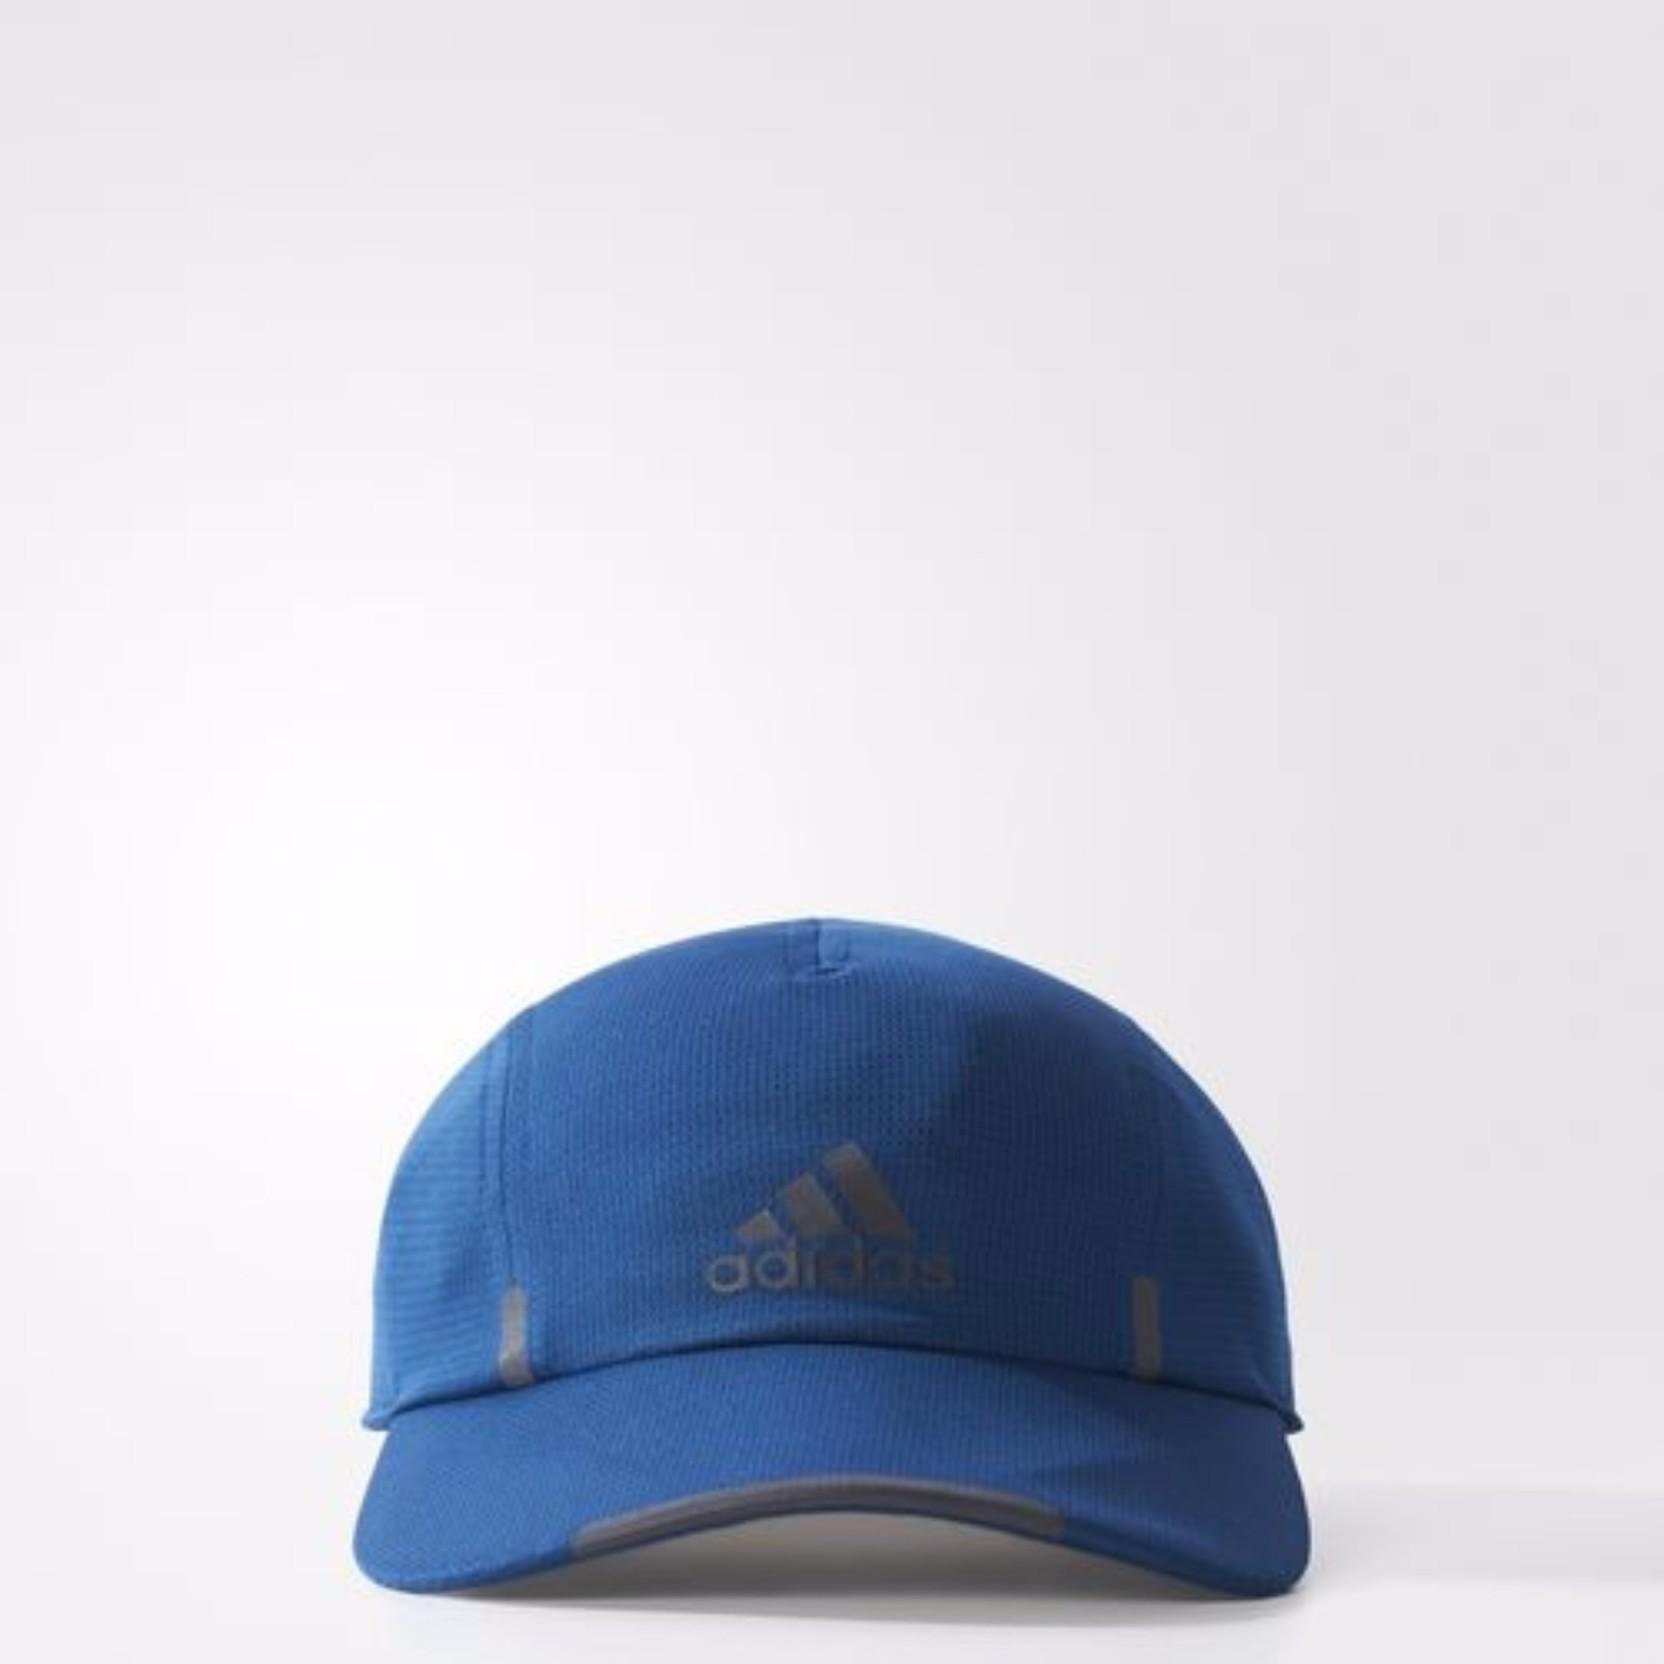 ADIDAS Solid RUN CLMCO Cap - Buy ADIDAS Solid RUN CLMCO Cap Online ... 53bde7f2986